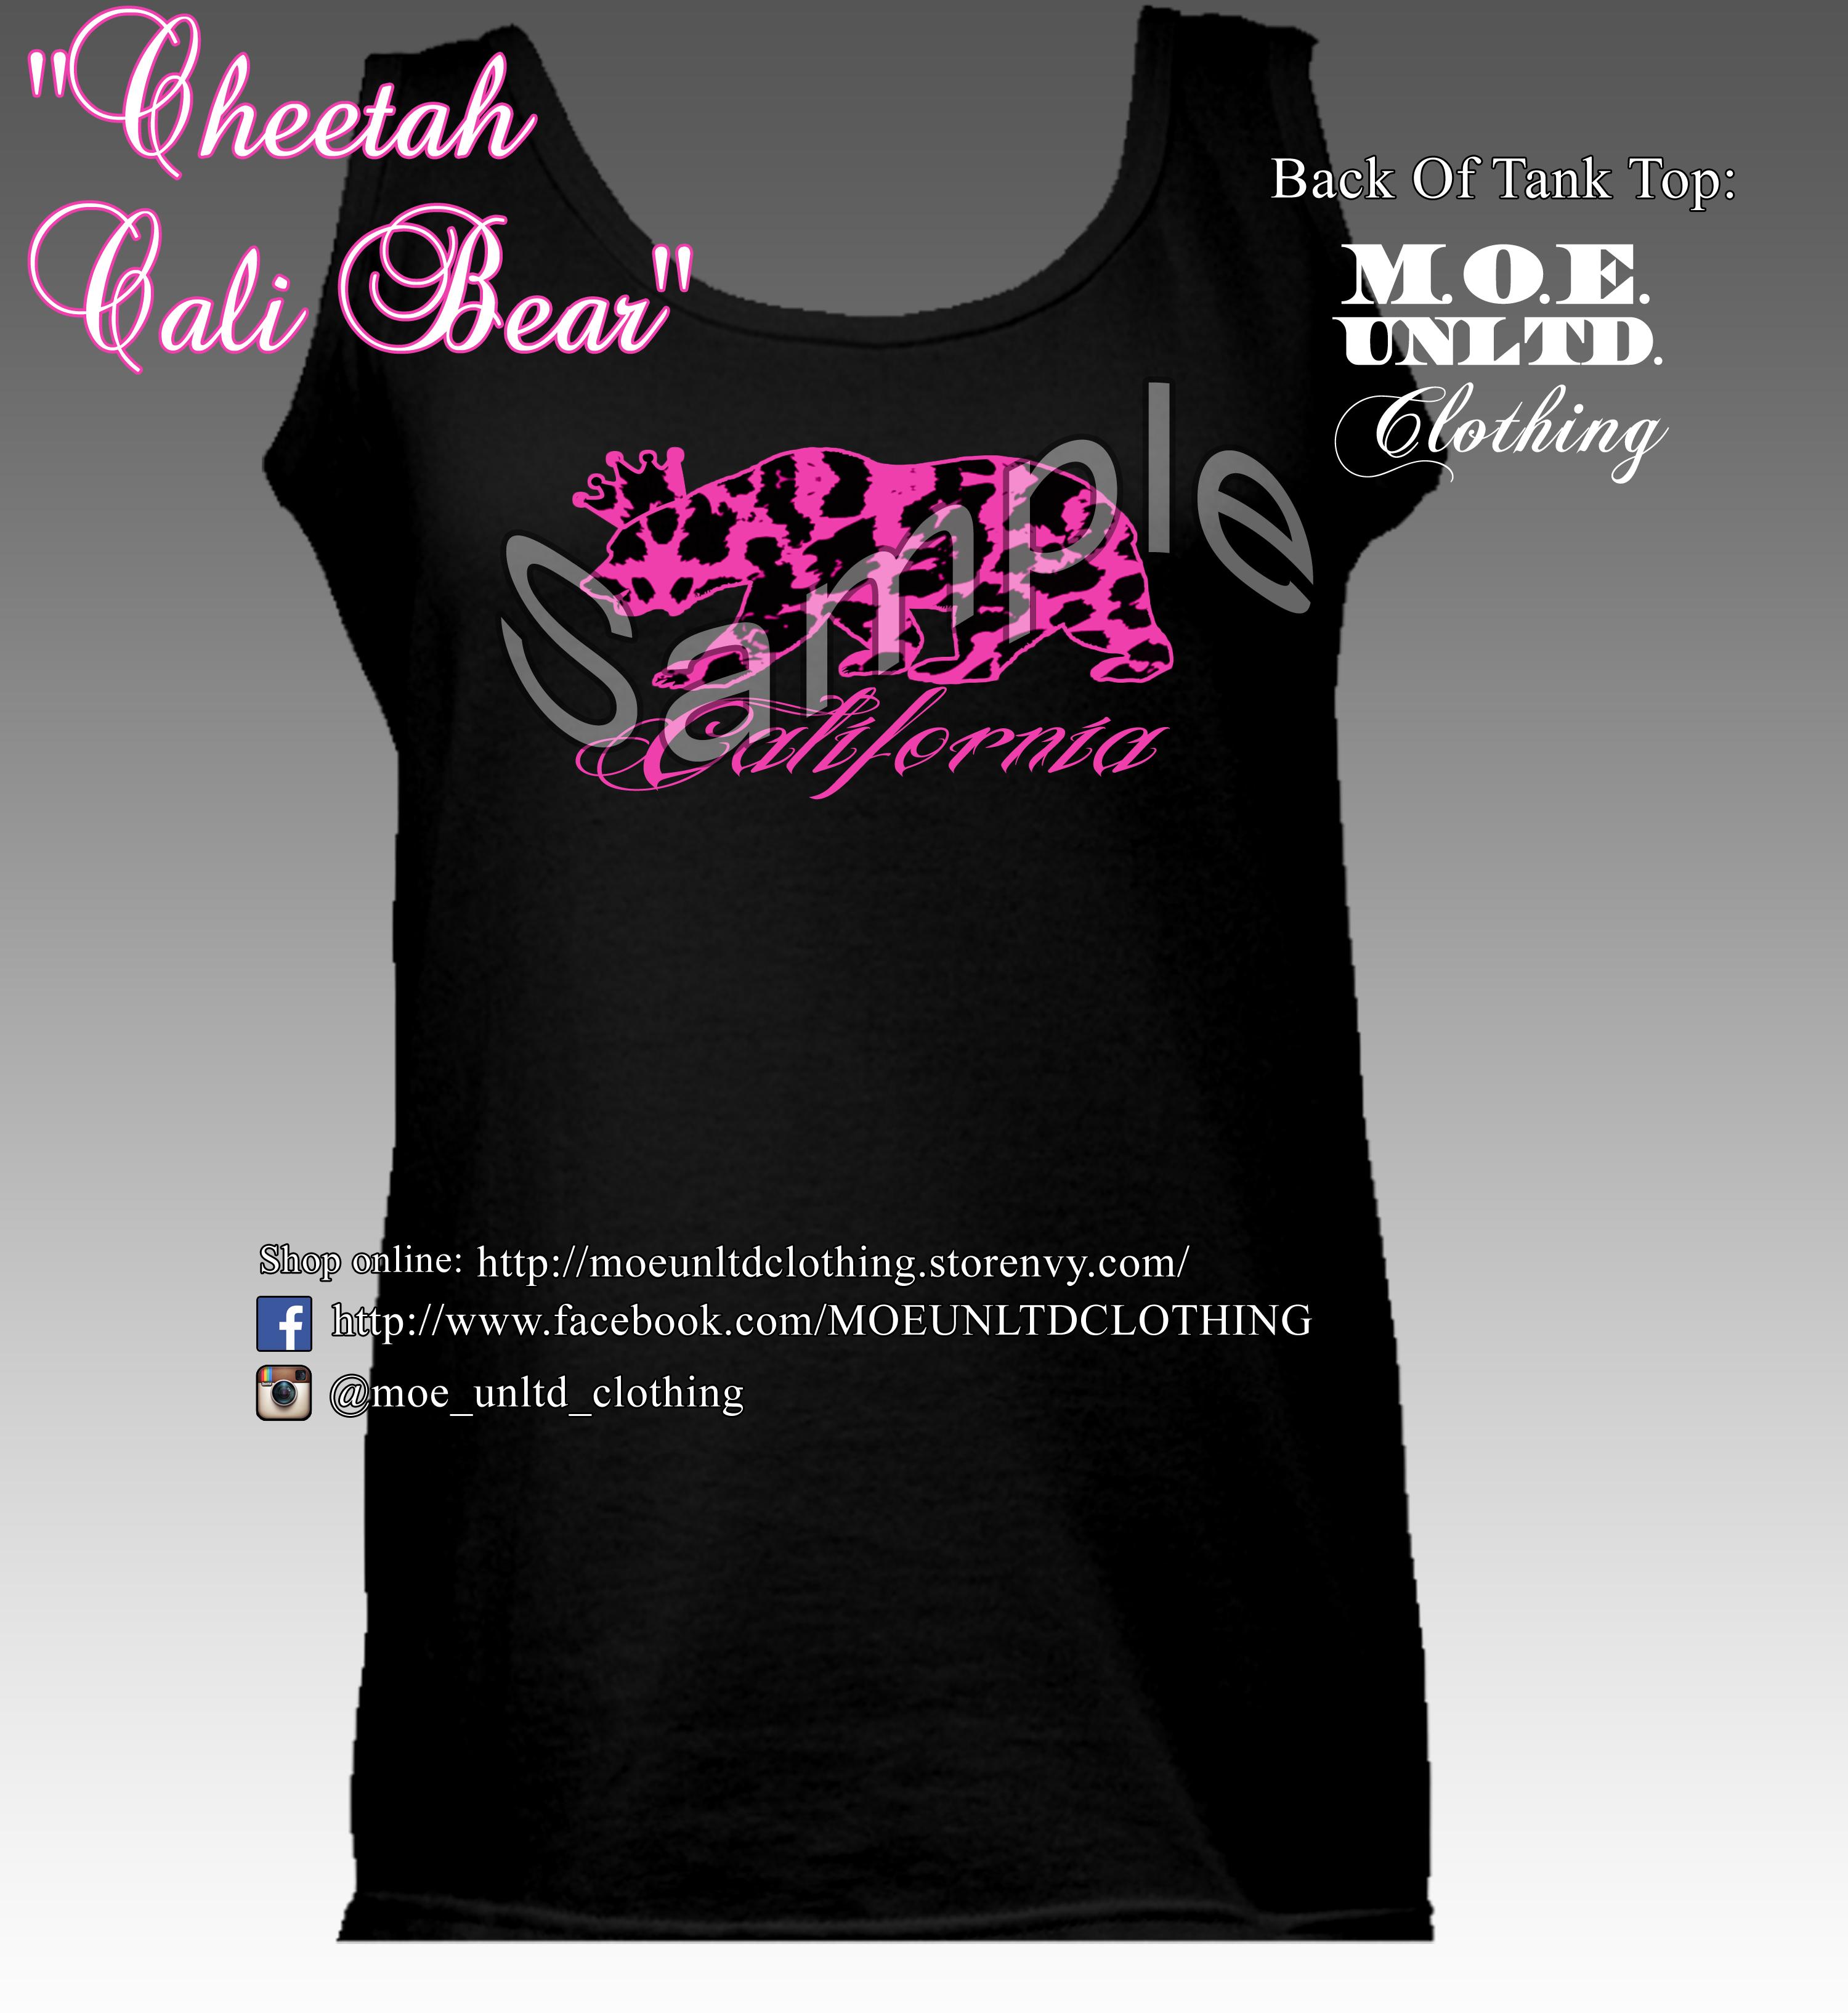 M o e unltd clothing cheetah cali bear women 39 s tank for T shirt printing visalia ca